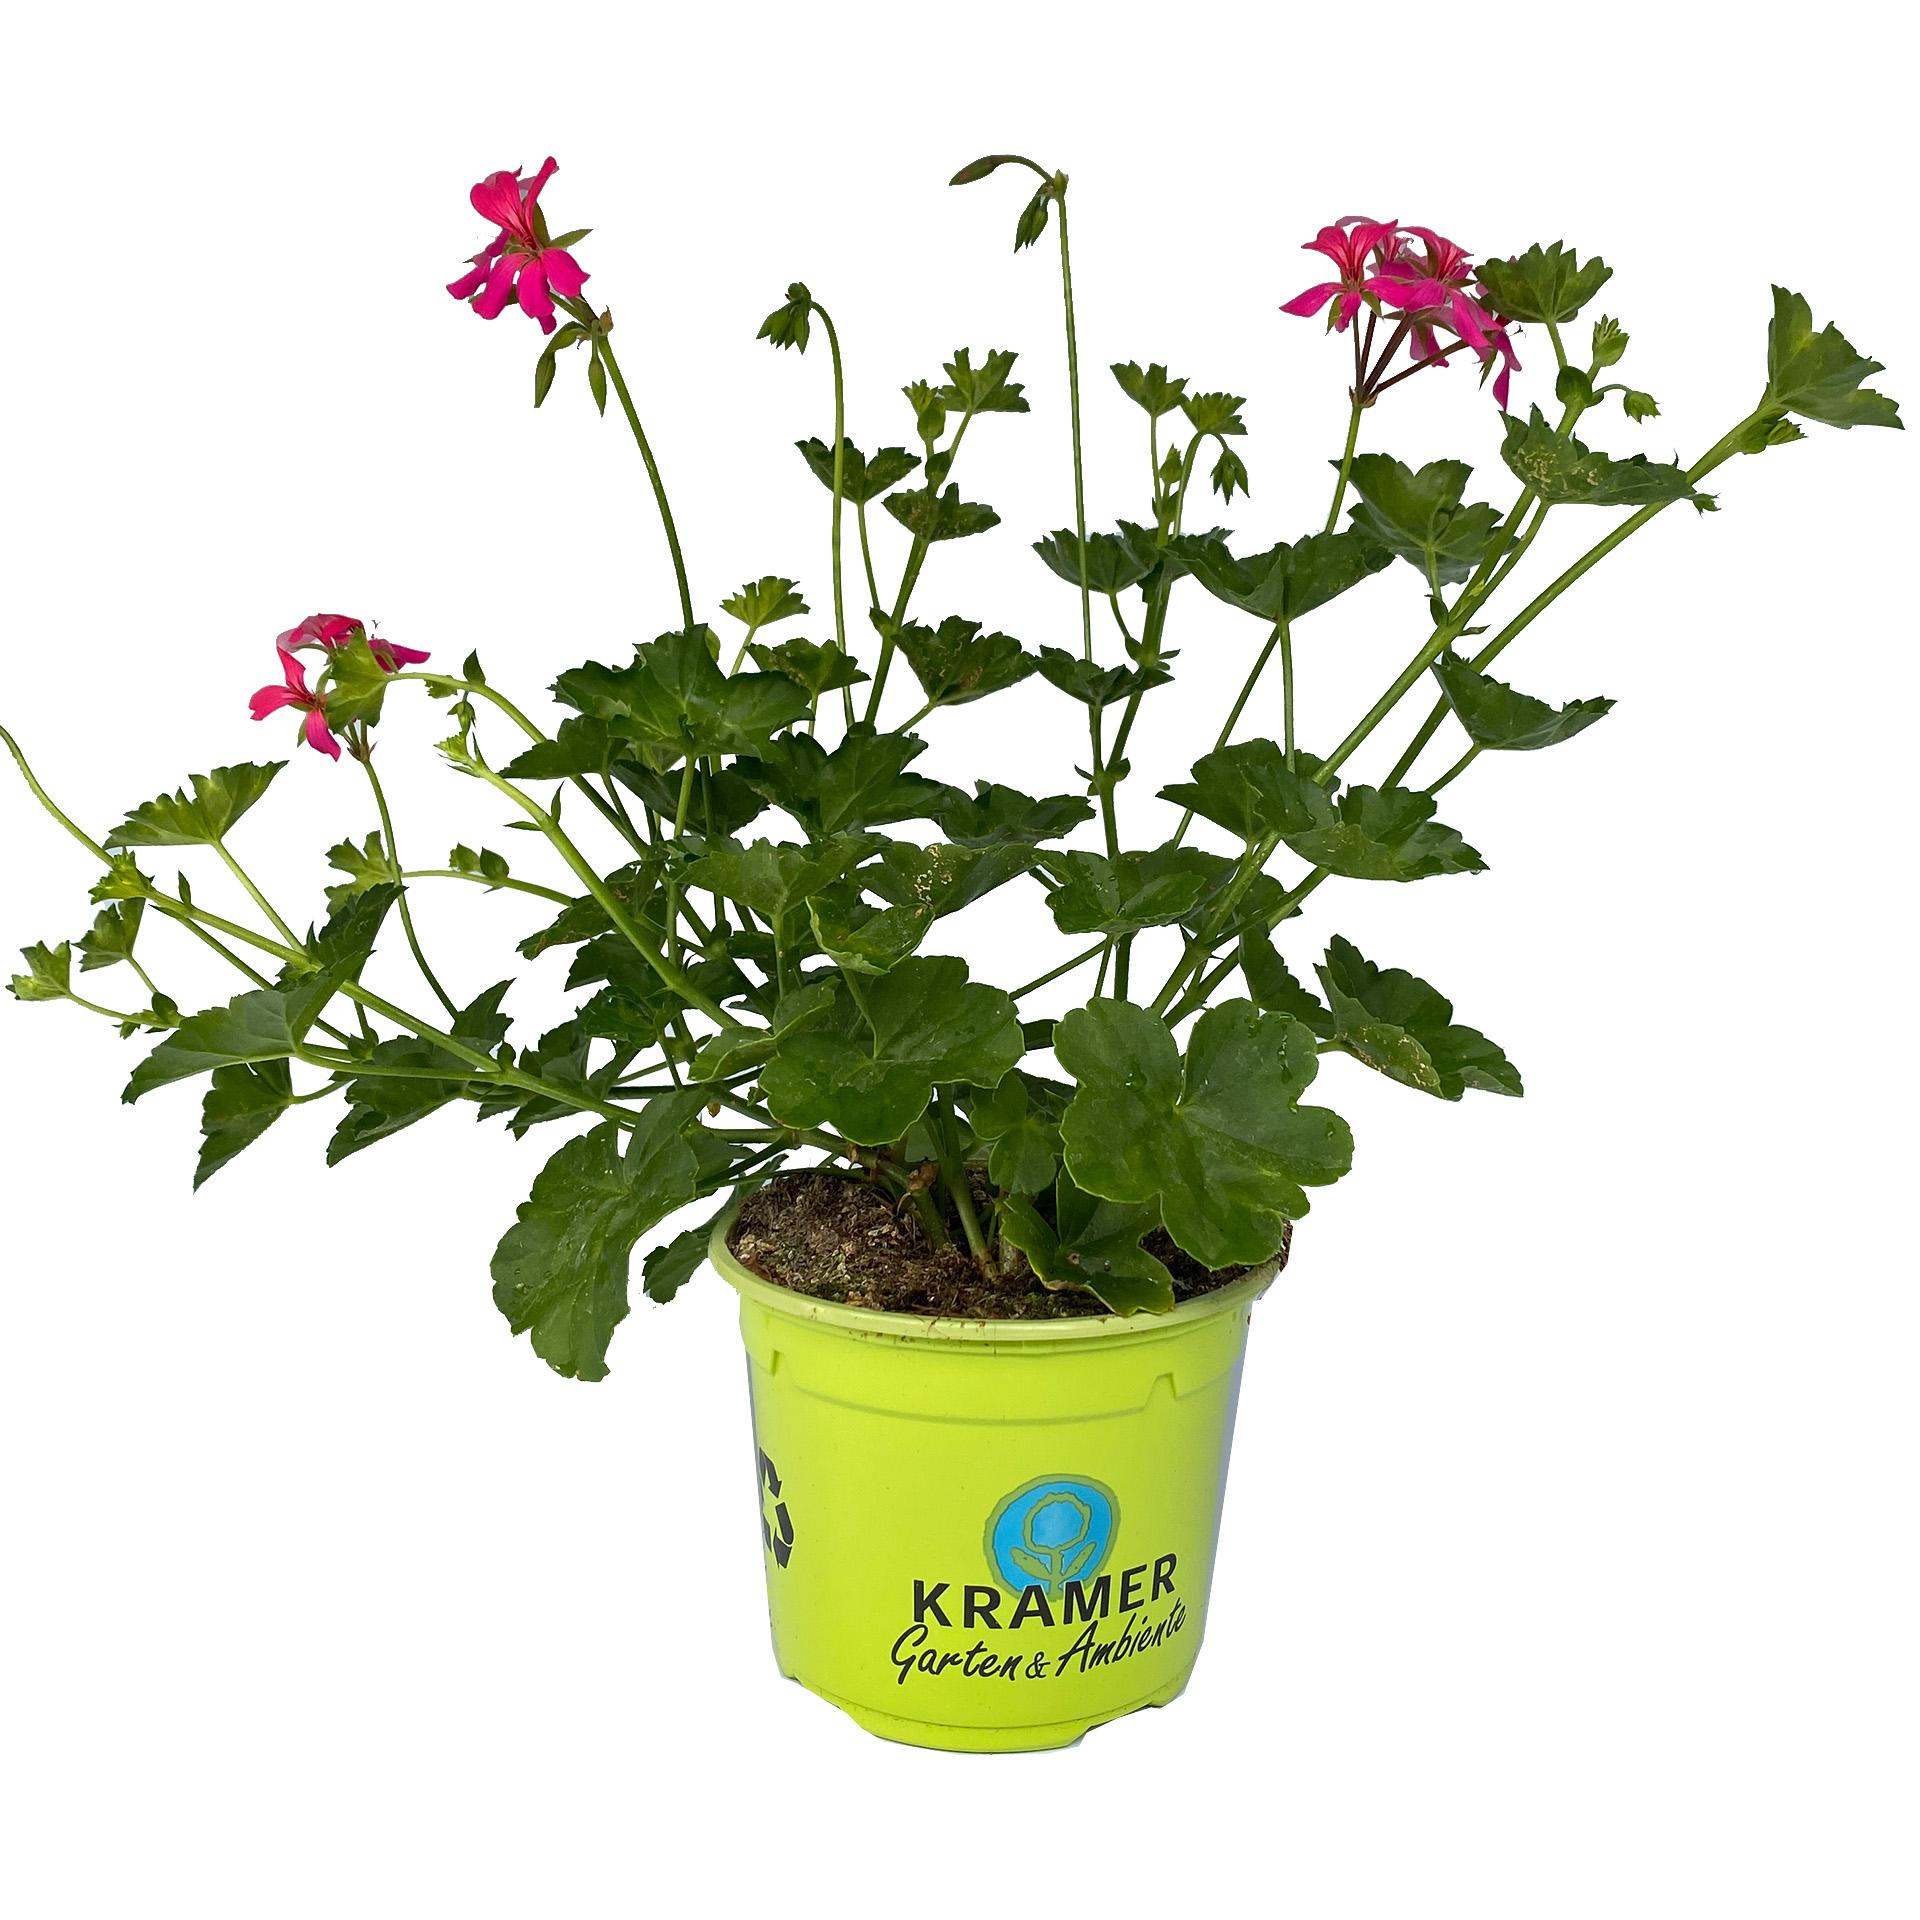 Geranie hängend - Pelargonium peltatum 'Balcon Noa' pink, 12cm Topf